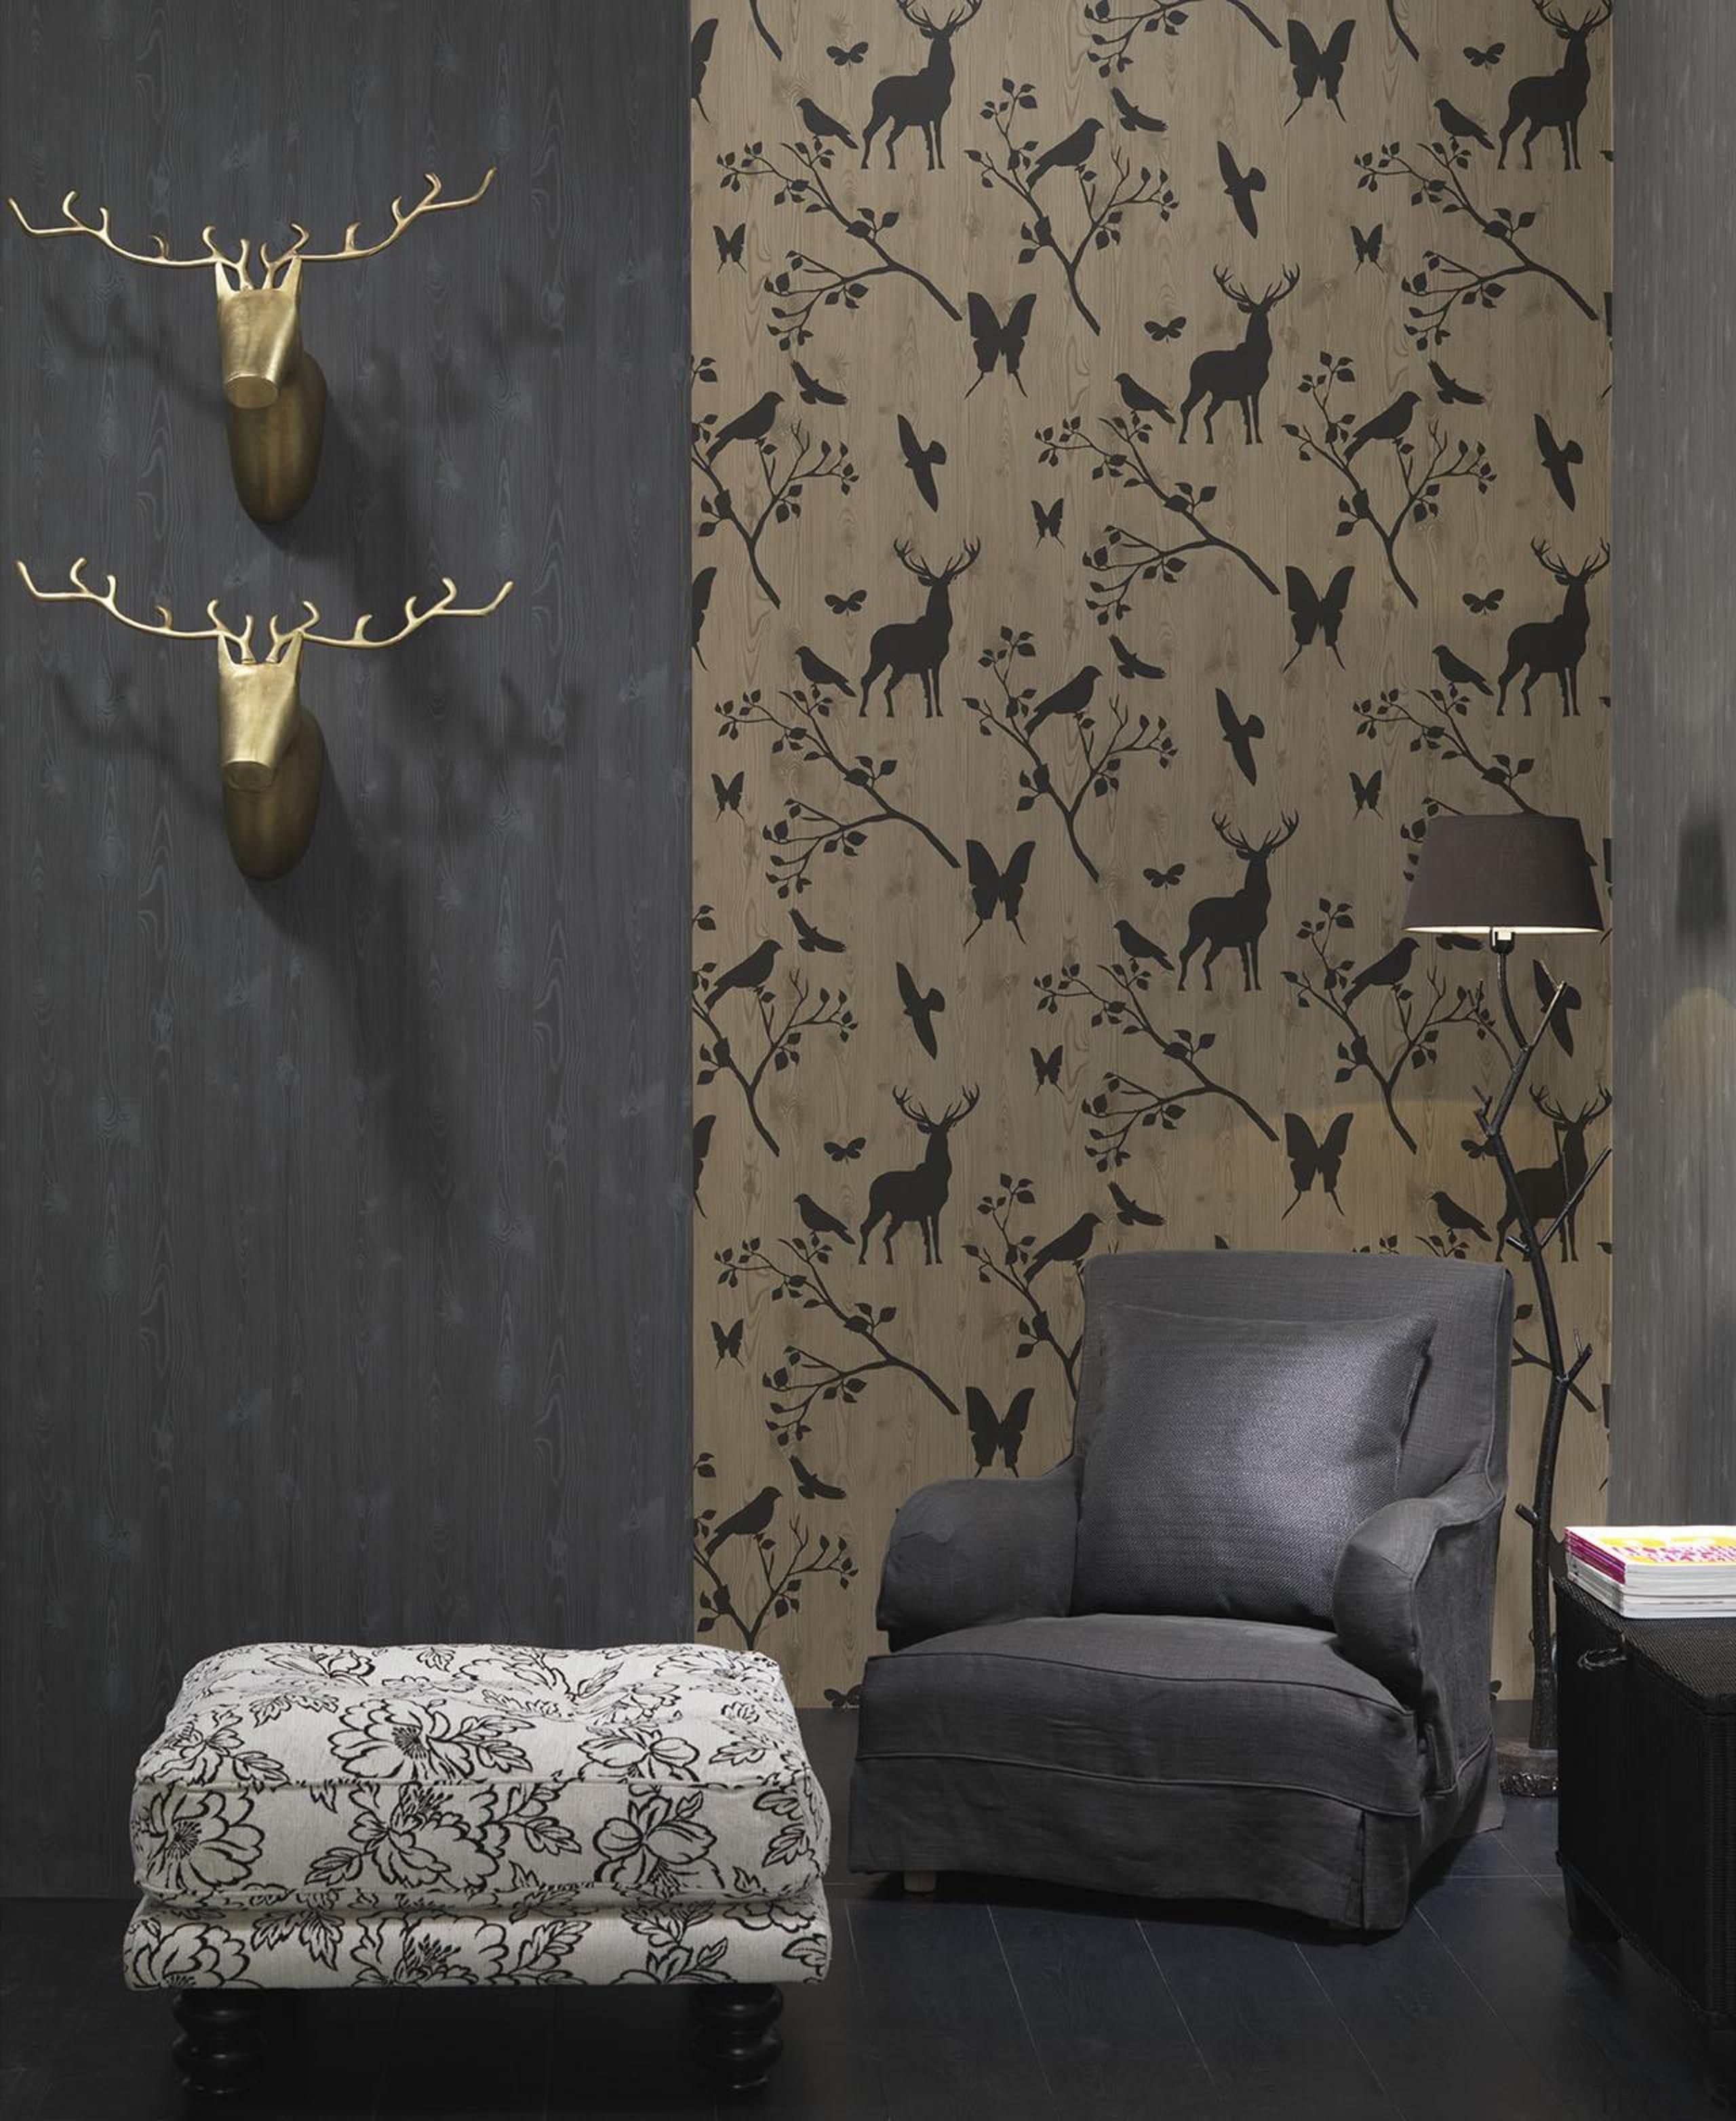 Modern Style Range - decor   interior design decor, interior design, living room, wall, wallpaper, black, gray